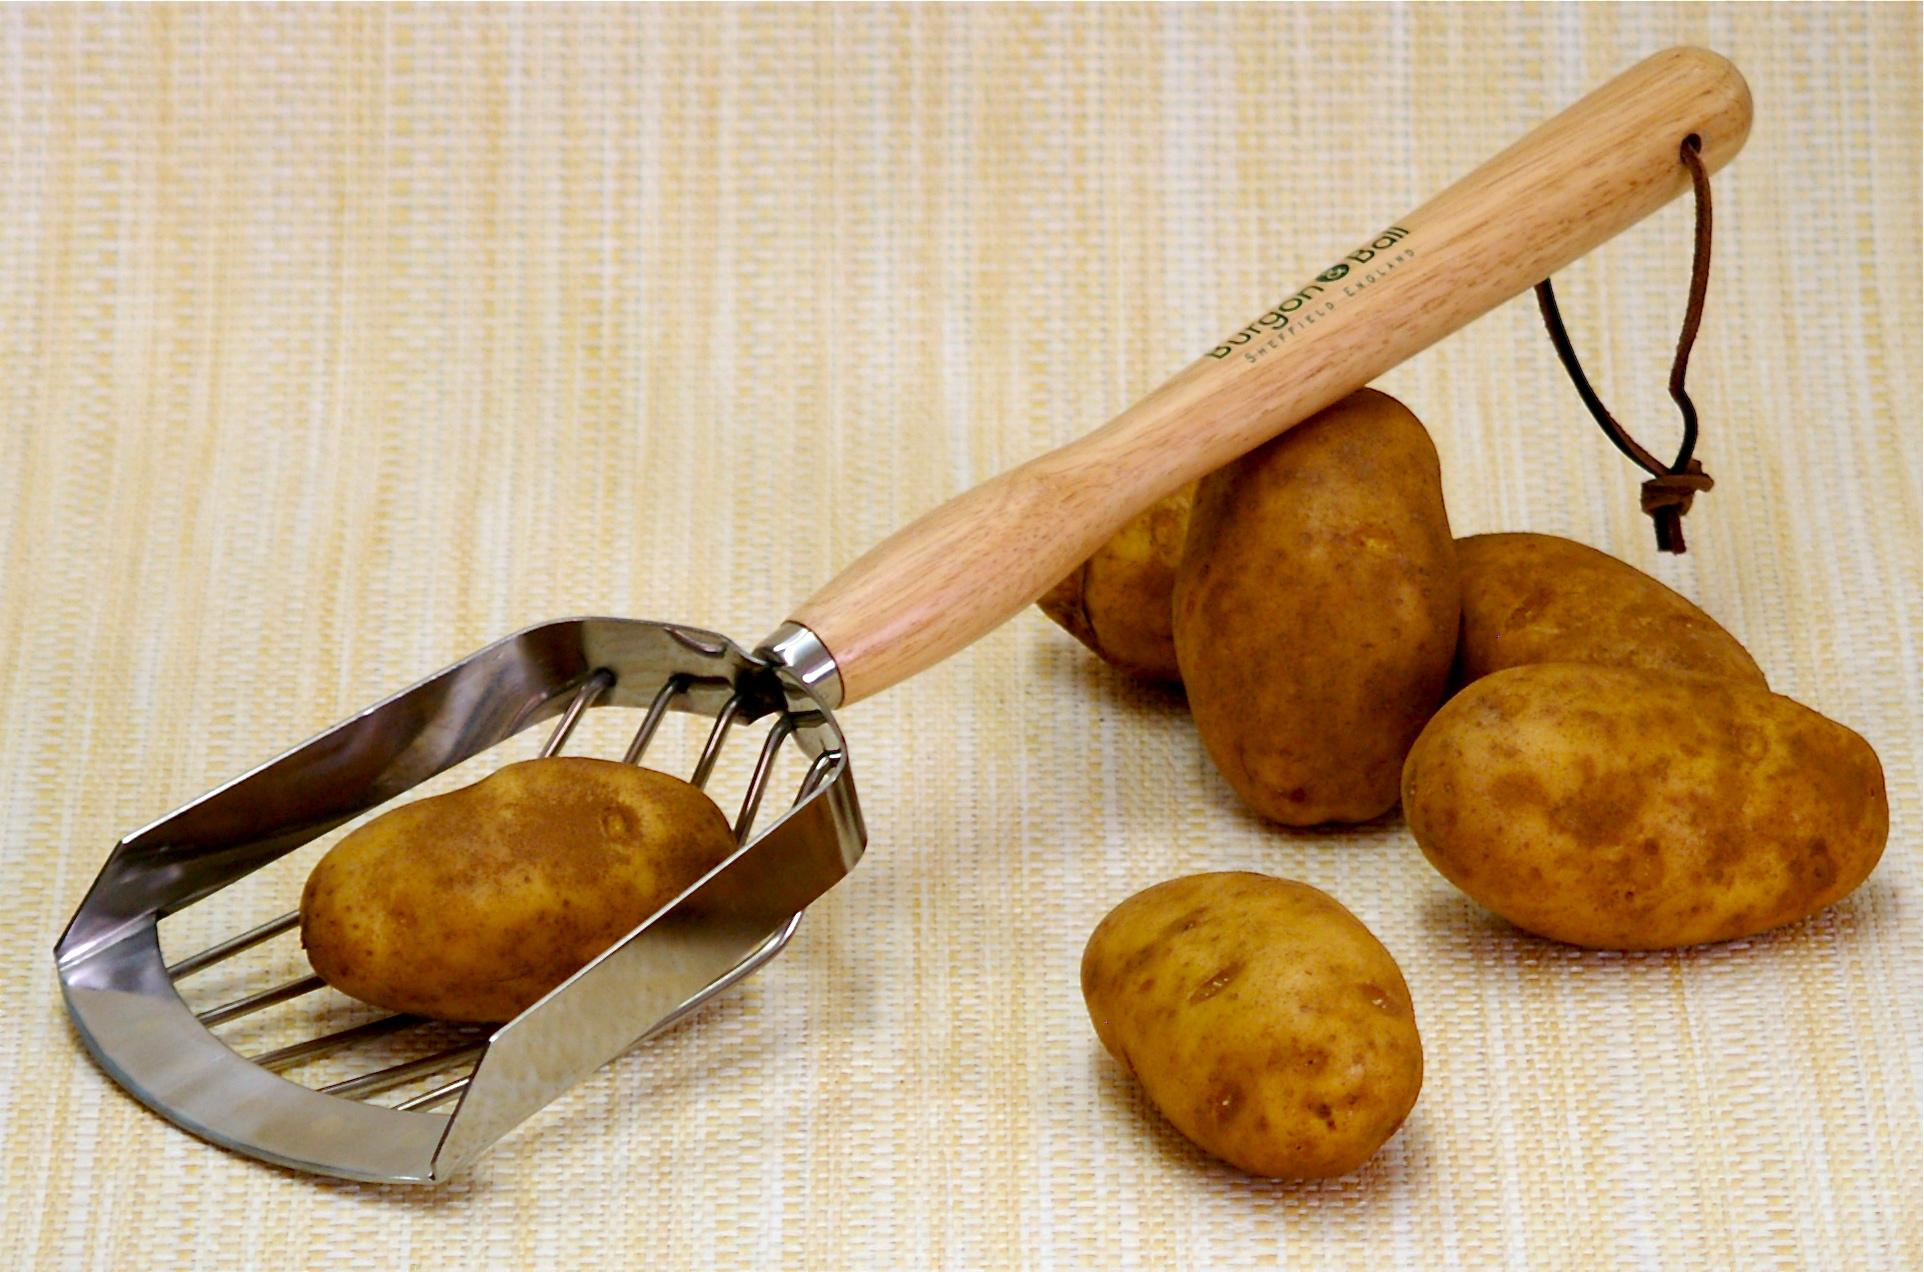 potato harvesting scoop by burgon and ball 18 garden shop online. Black Bedroom Furniture Sets. Home Design Ideas